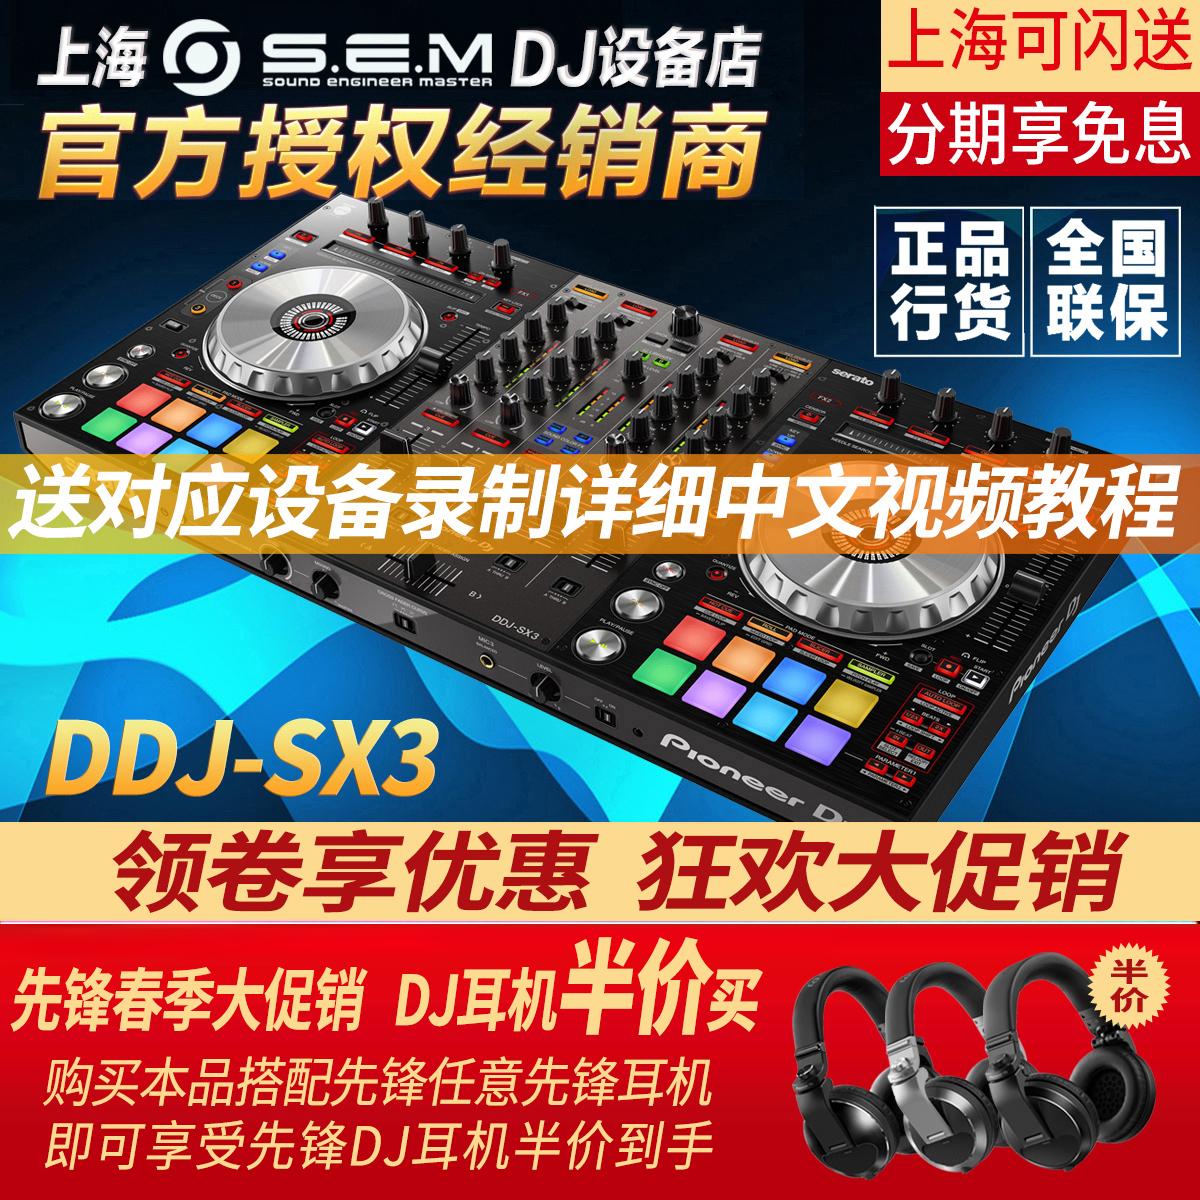 DJ установки / микшеры Артикул 42588062680